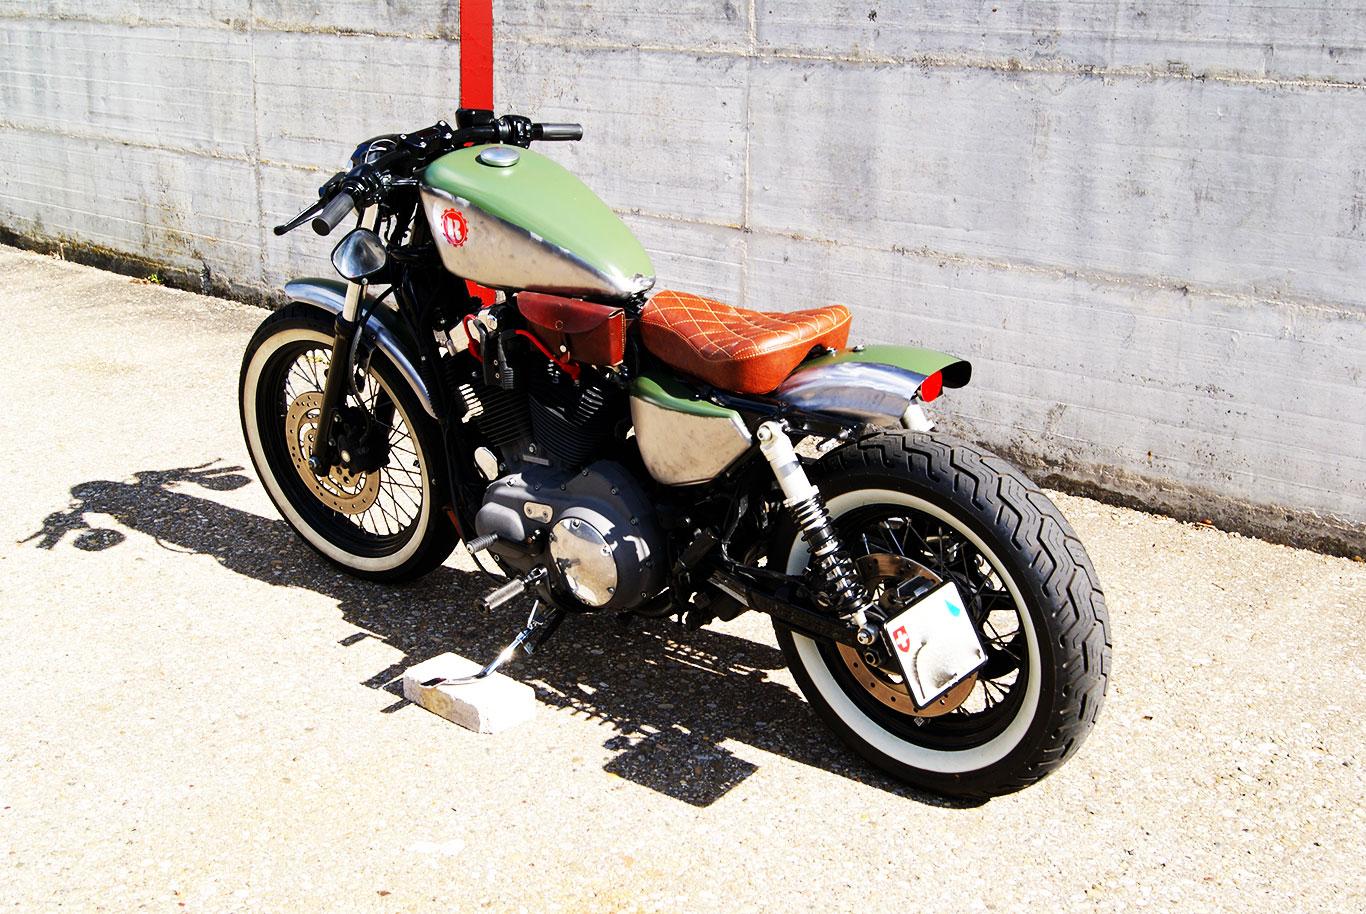 Harley Davidson Nightster Custom - OTOMOTIF.ORG